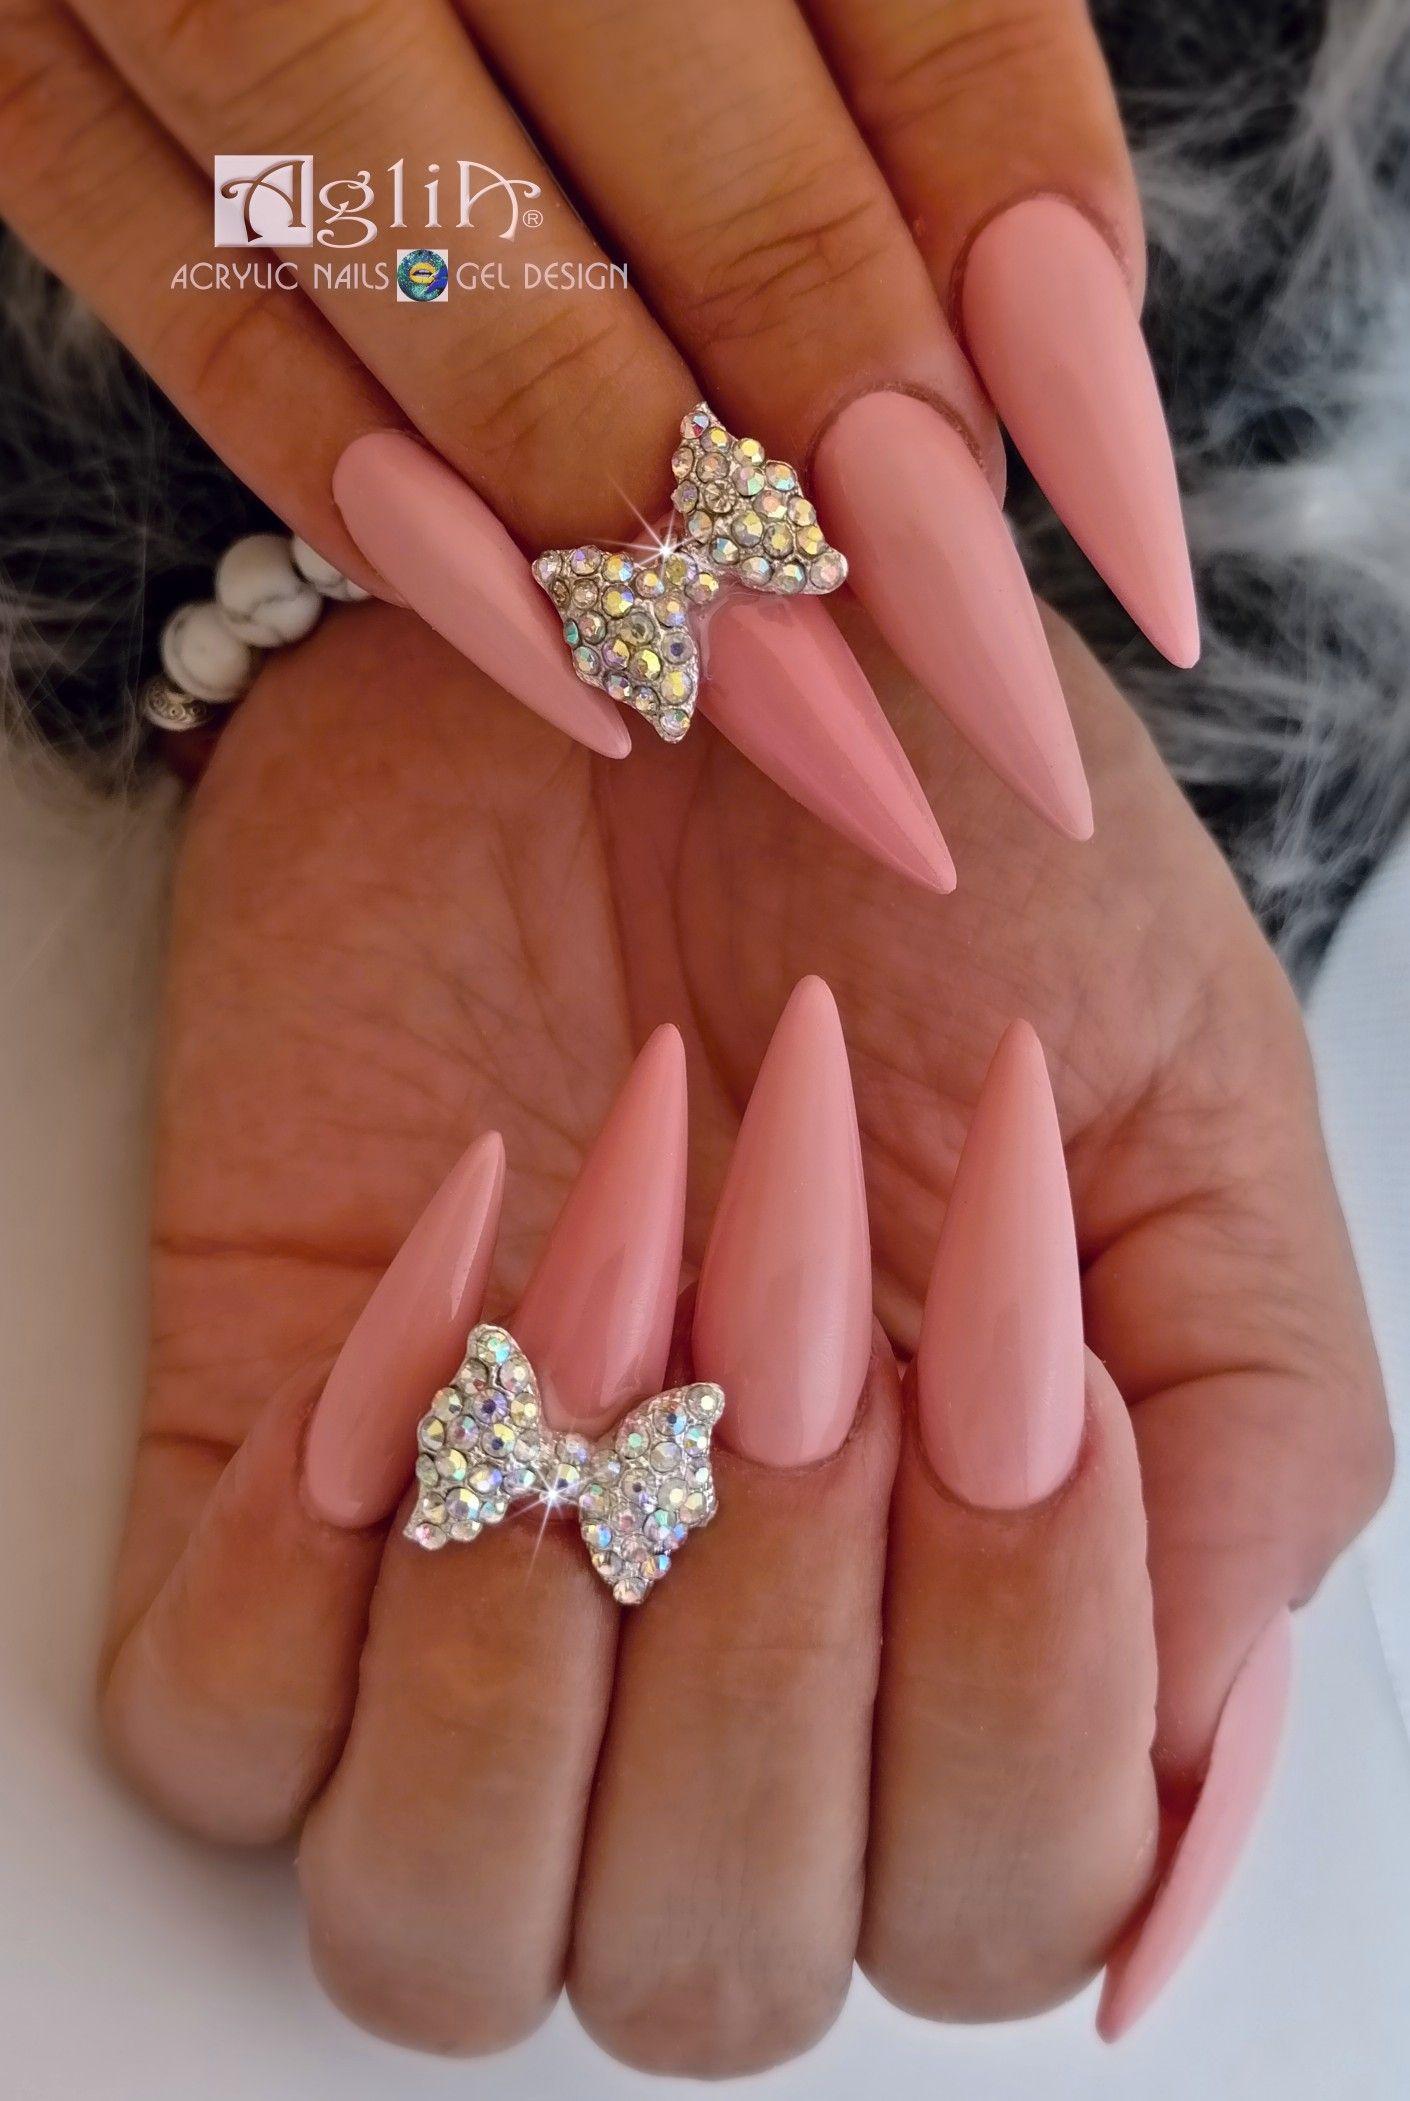 Acrylic Nails Gel Design Gel Designs Work Nails Gel Nails